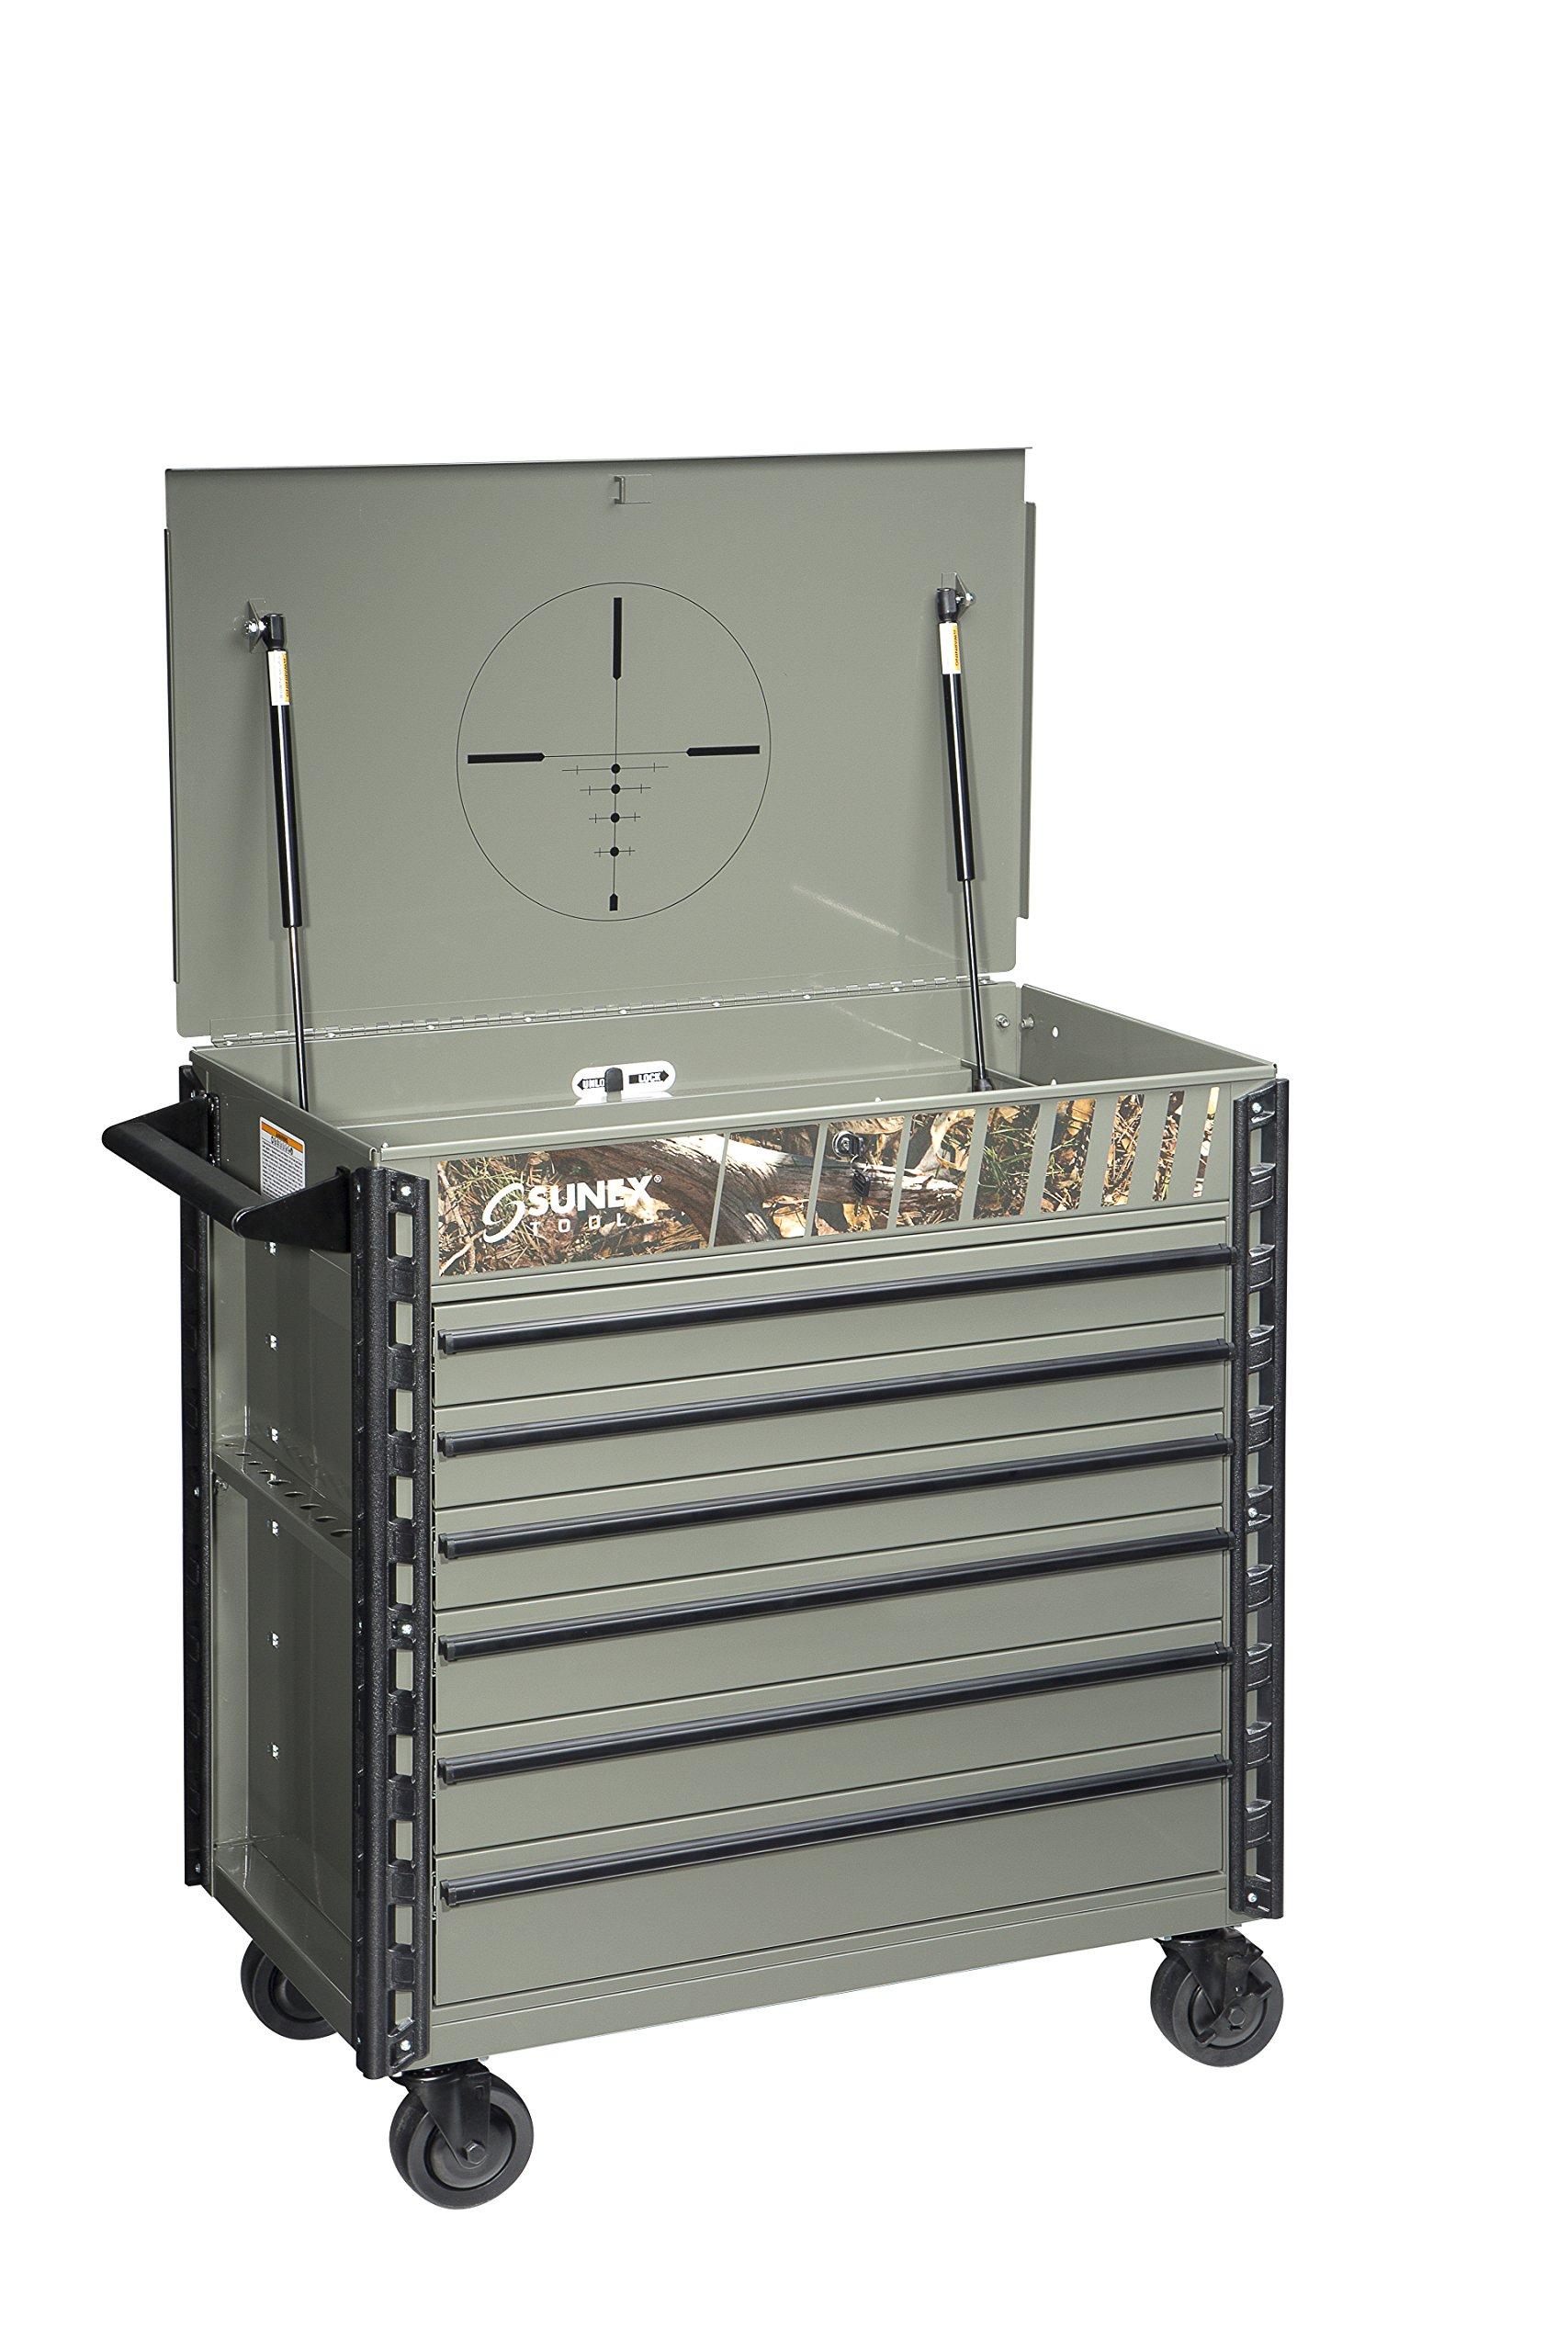 Sunex 8057CAMO Premium Full Drawer Camo Service Cart, Camo by Sunex Tools